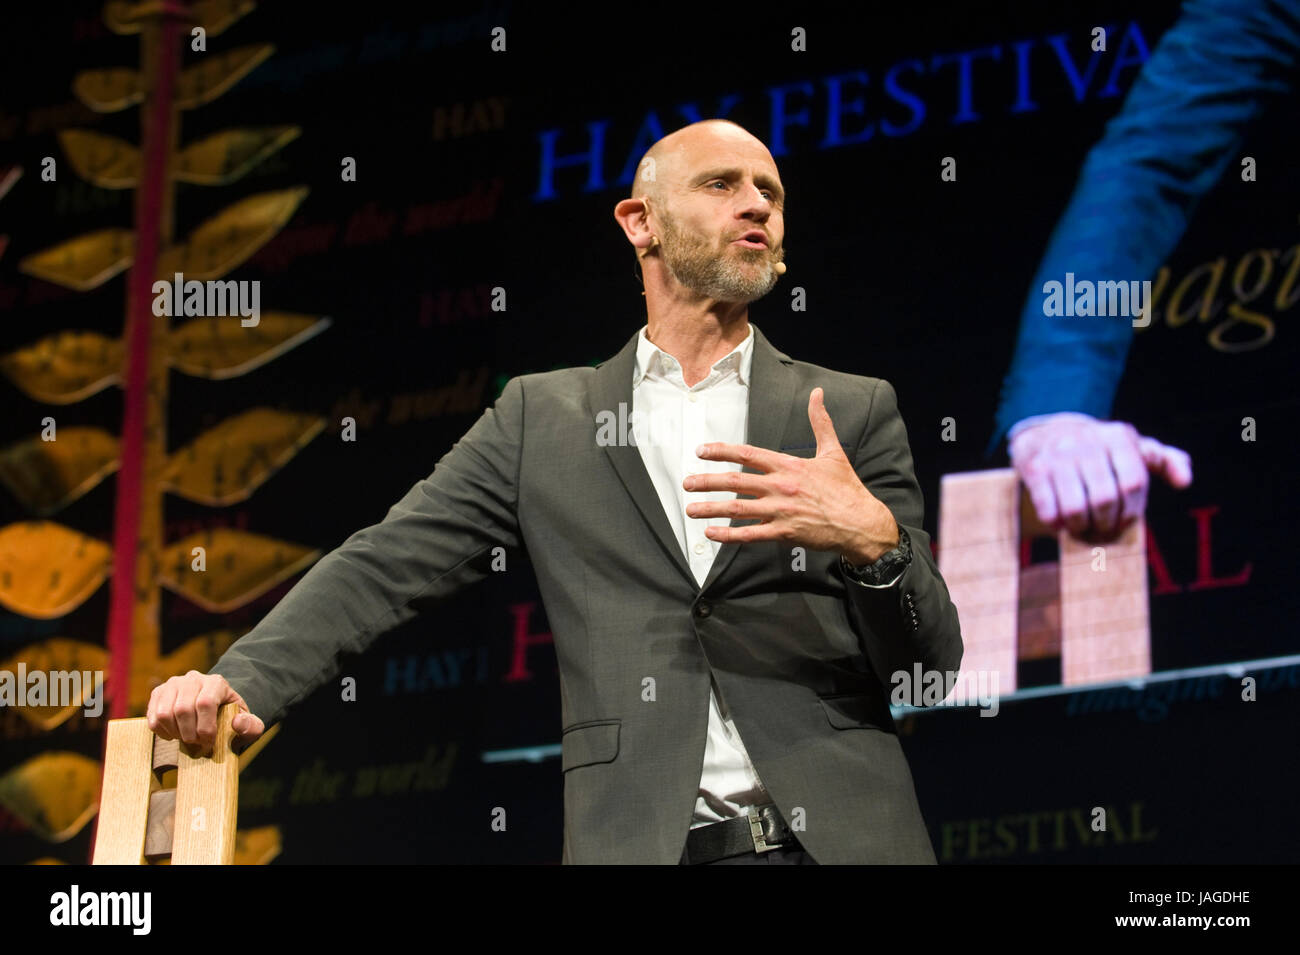 Evan Davis BBC journalist speaking on stage at Hay Festival 2017 Hay-on-Wye Powys Wales UK - Stock Image